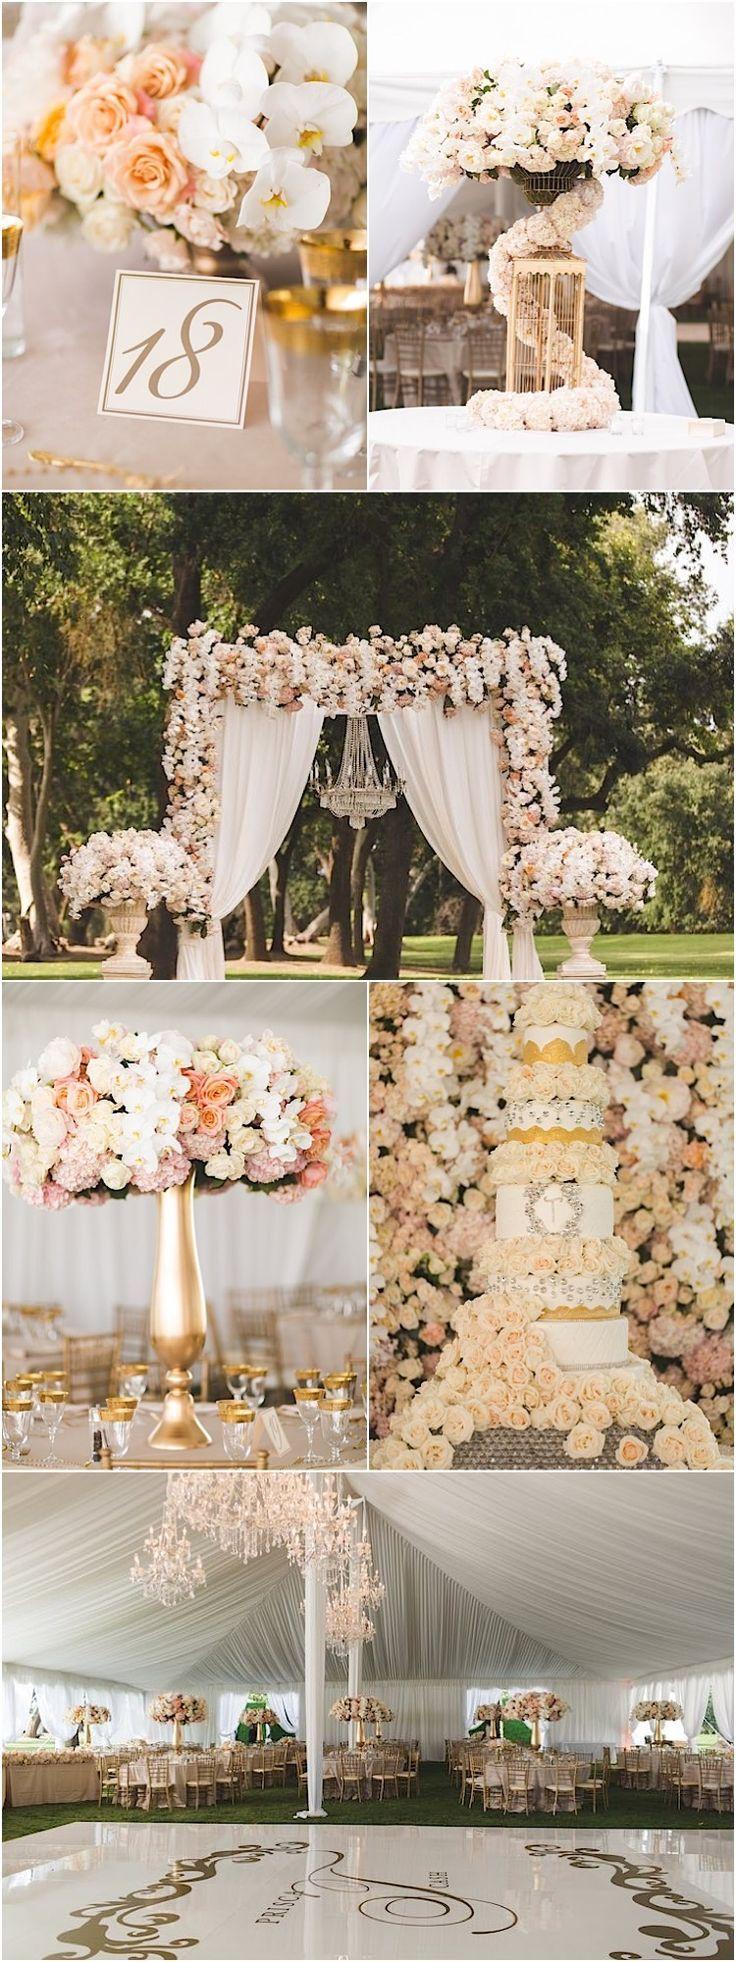 photographer: Reverie VP; Glamorous wedding reception idea;